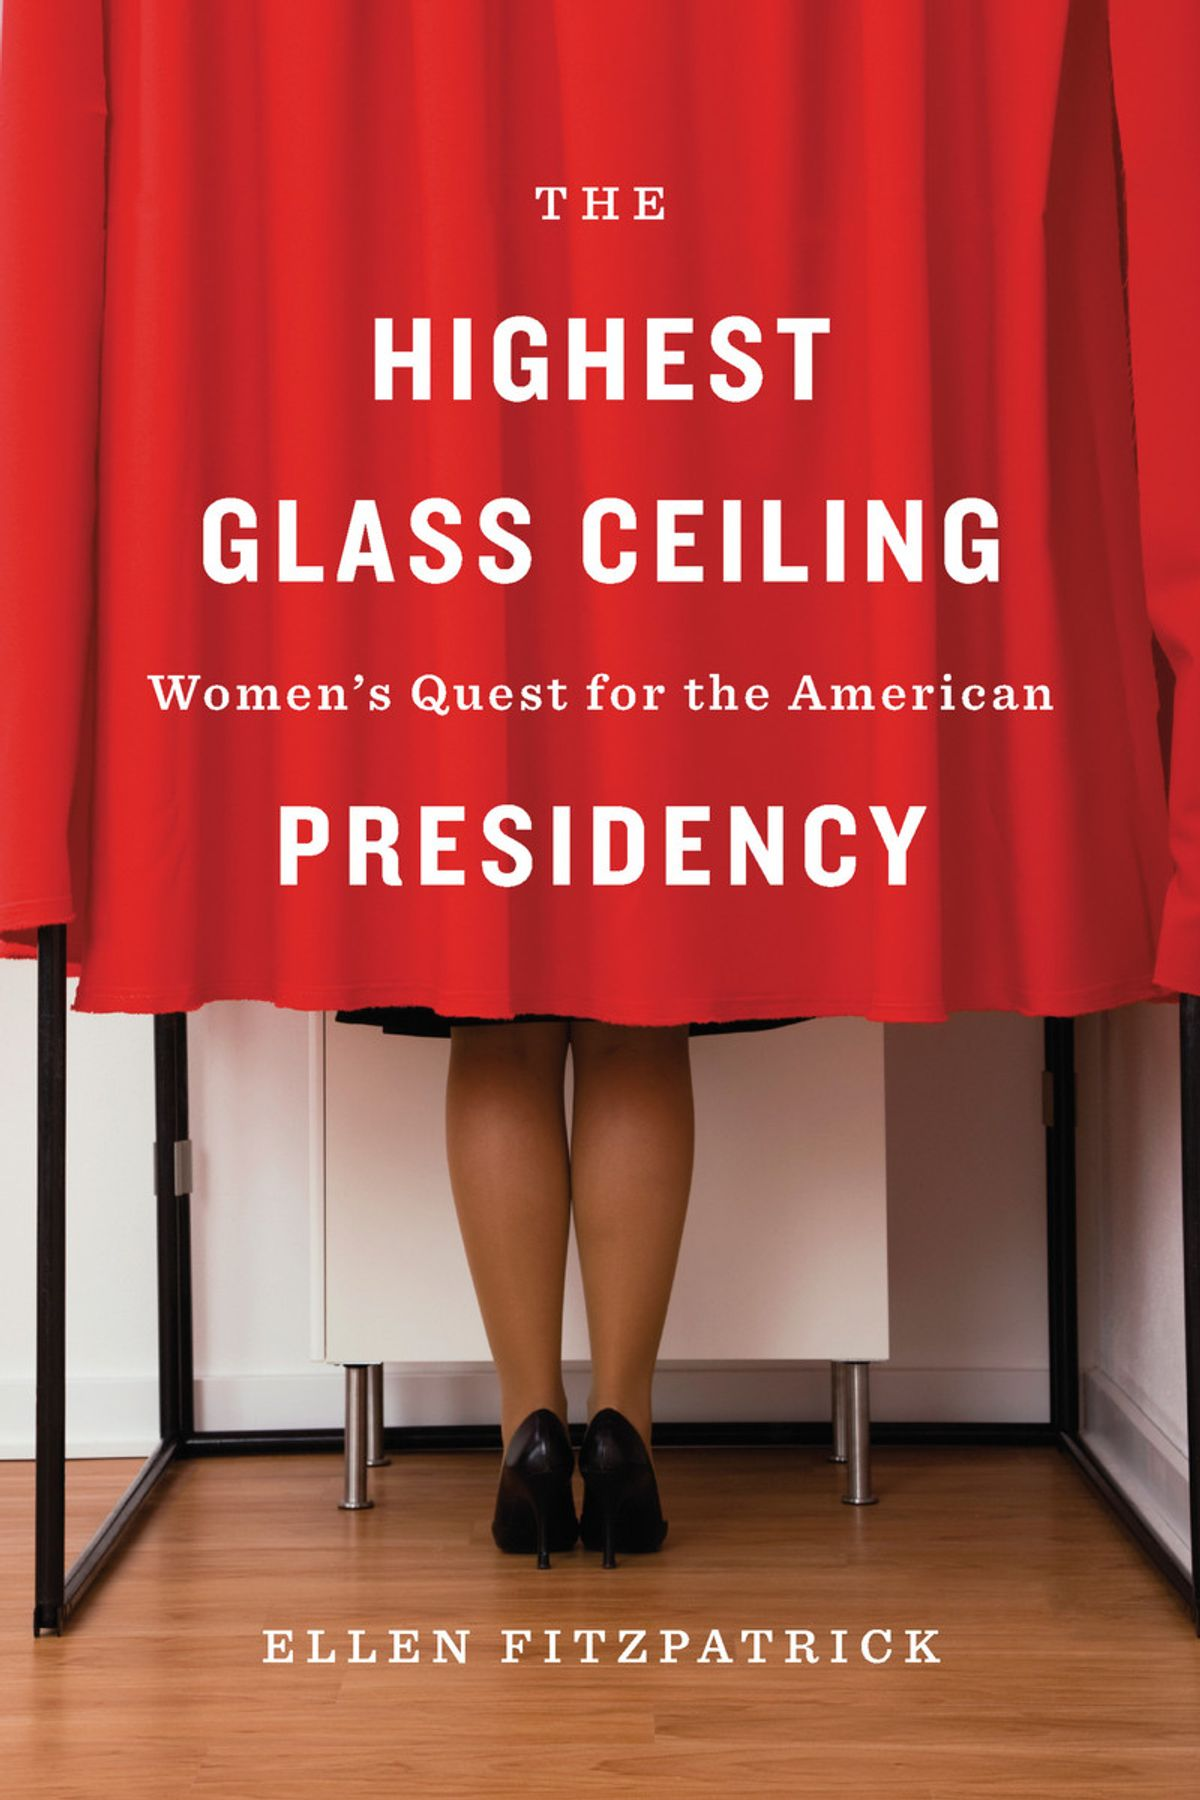 The Highest Glass Ceiling eBook by Ellen Fitzpatrick - 9780674496071 |  Rakuten Kobo India